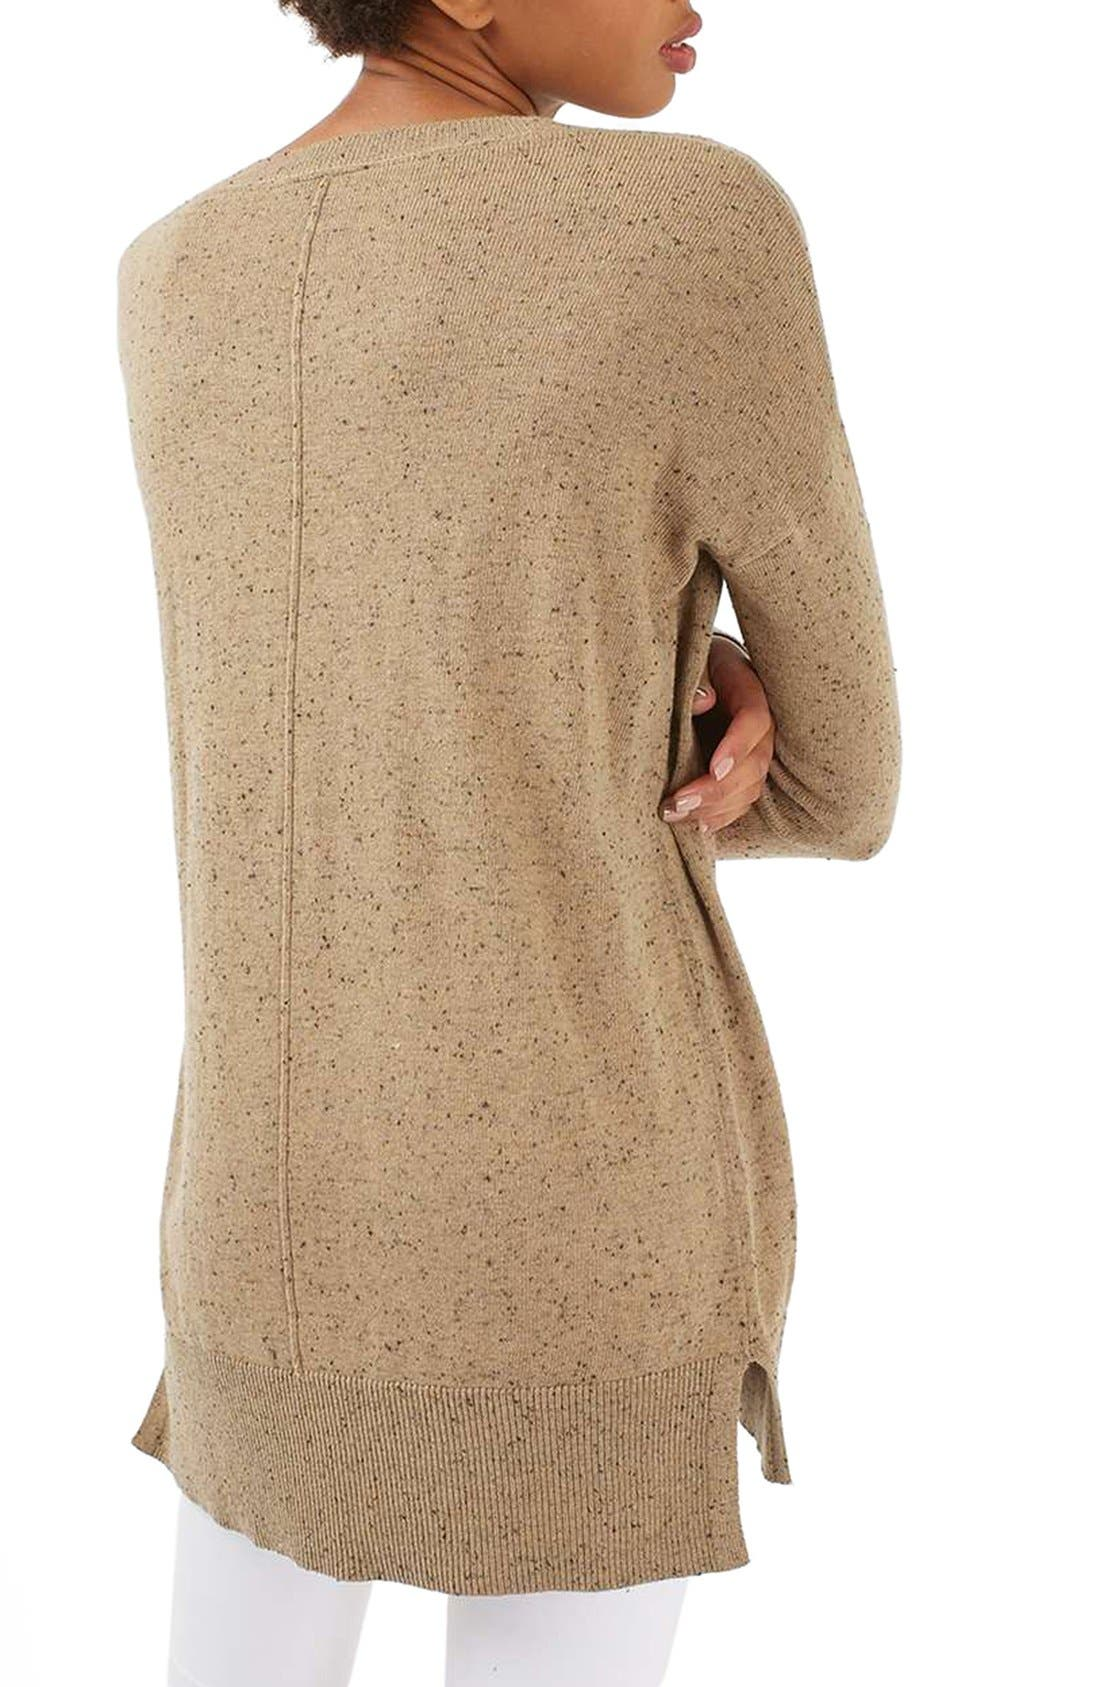 Lace V-Neck Sweater Tunic,                             Alternate thumbnail 6, color,                             230